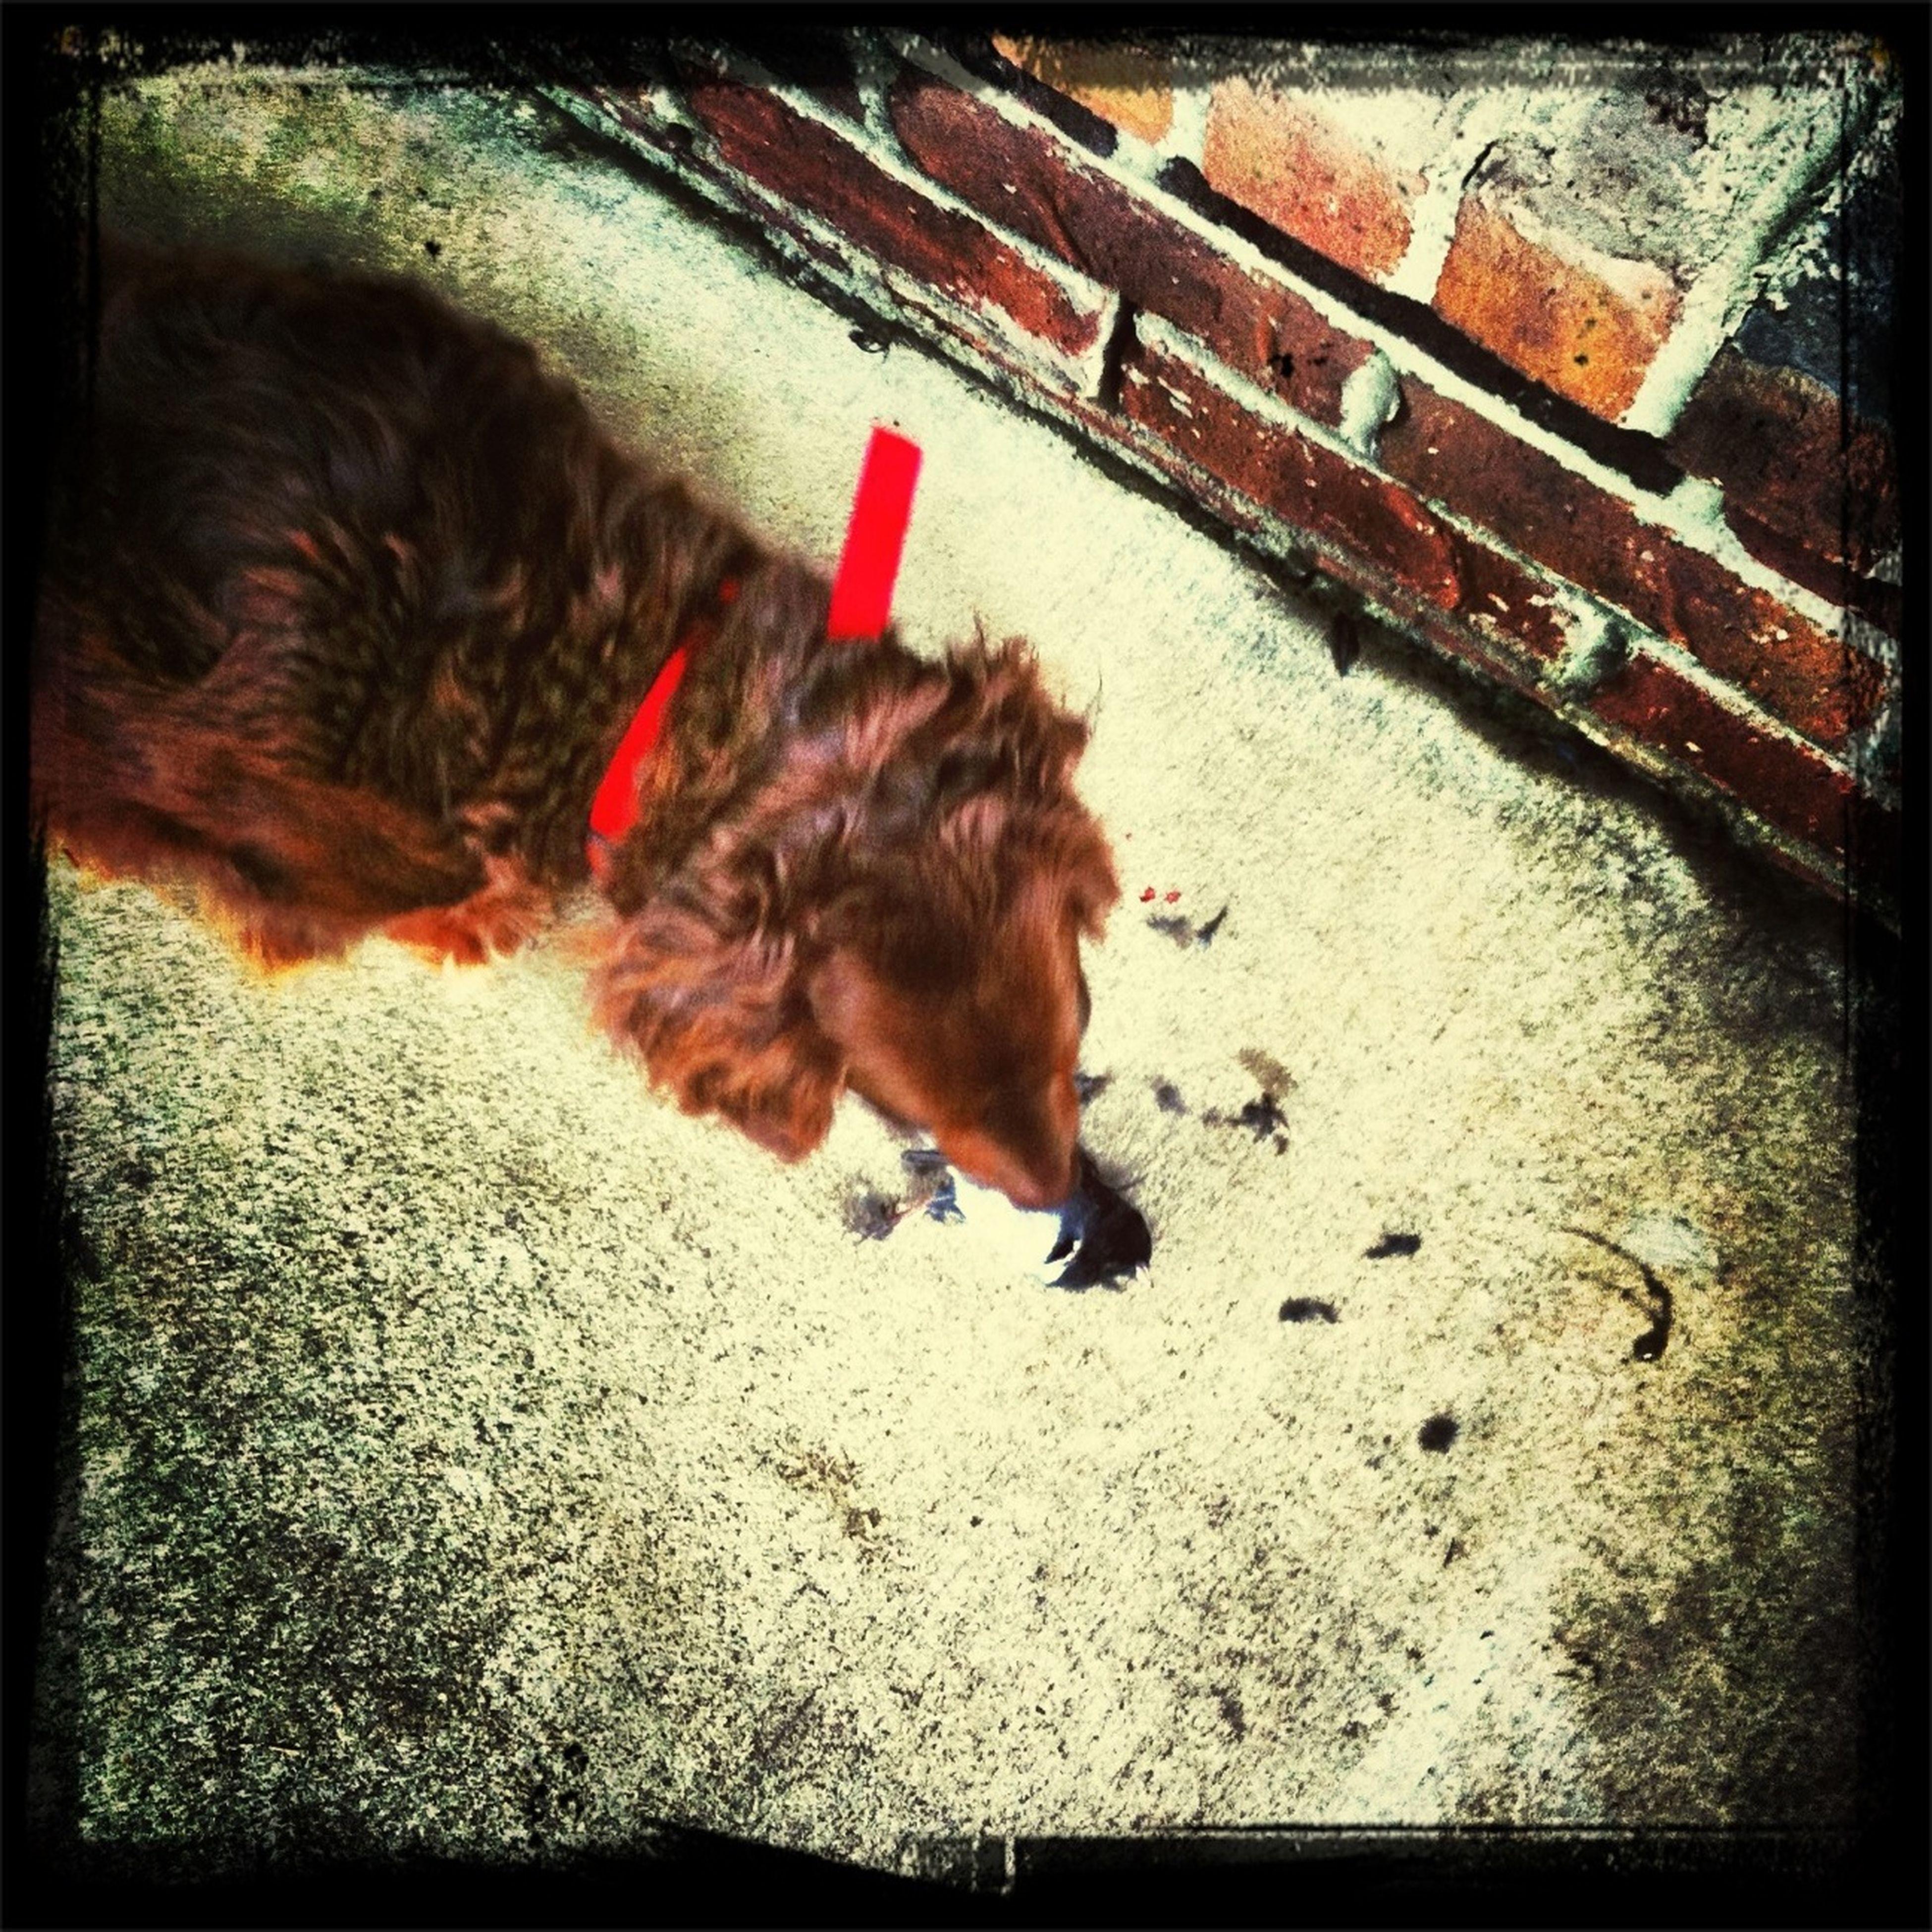 My dog caught a bird earlier today...